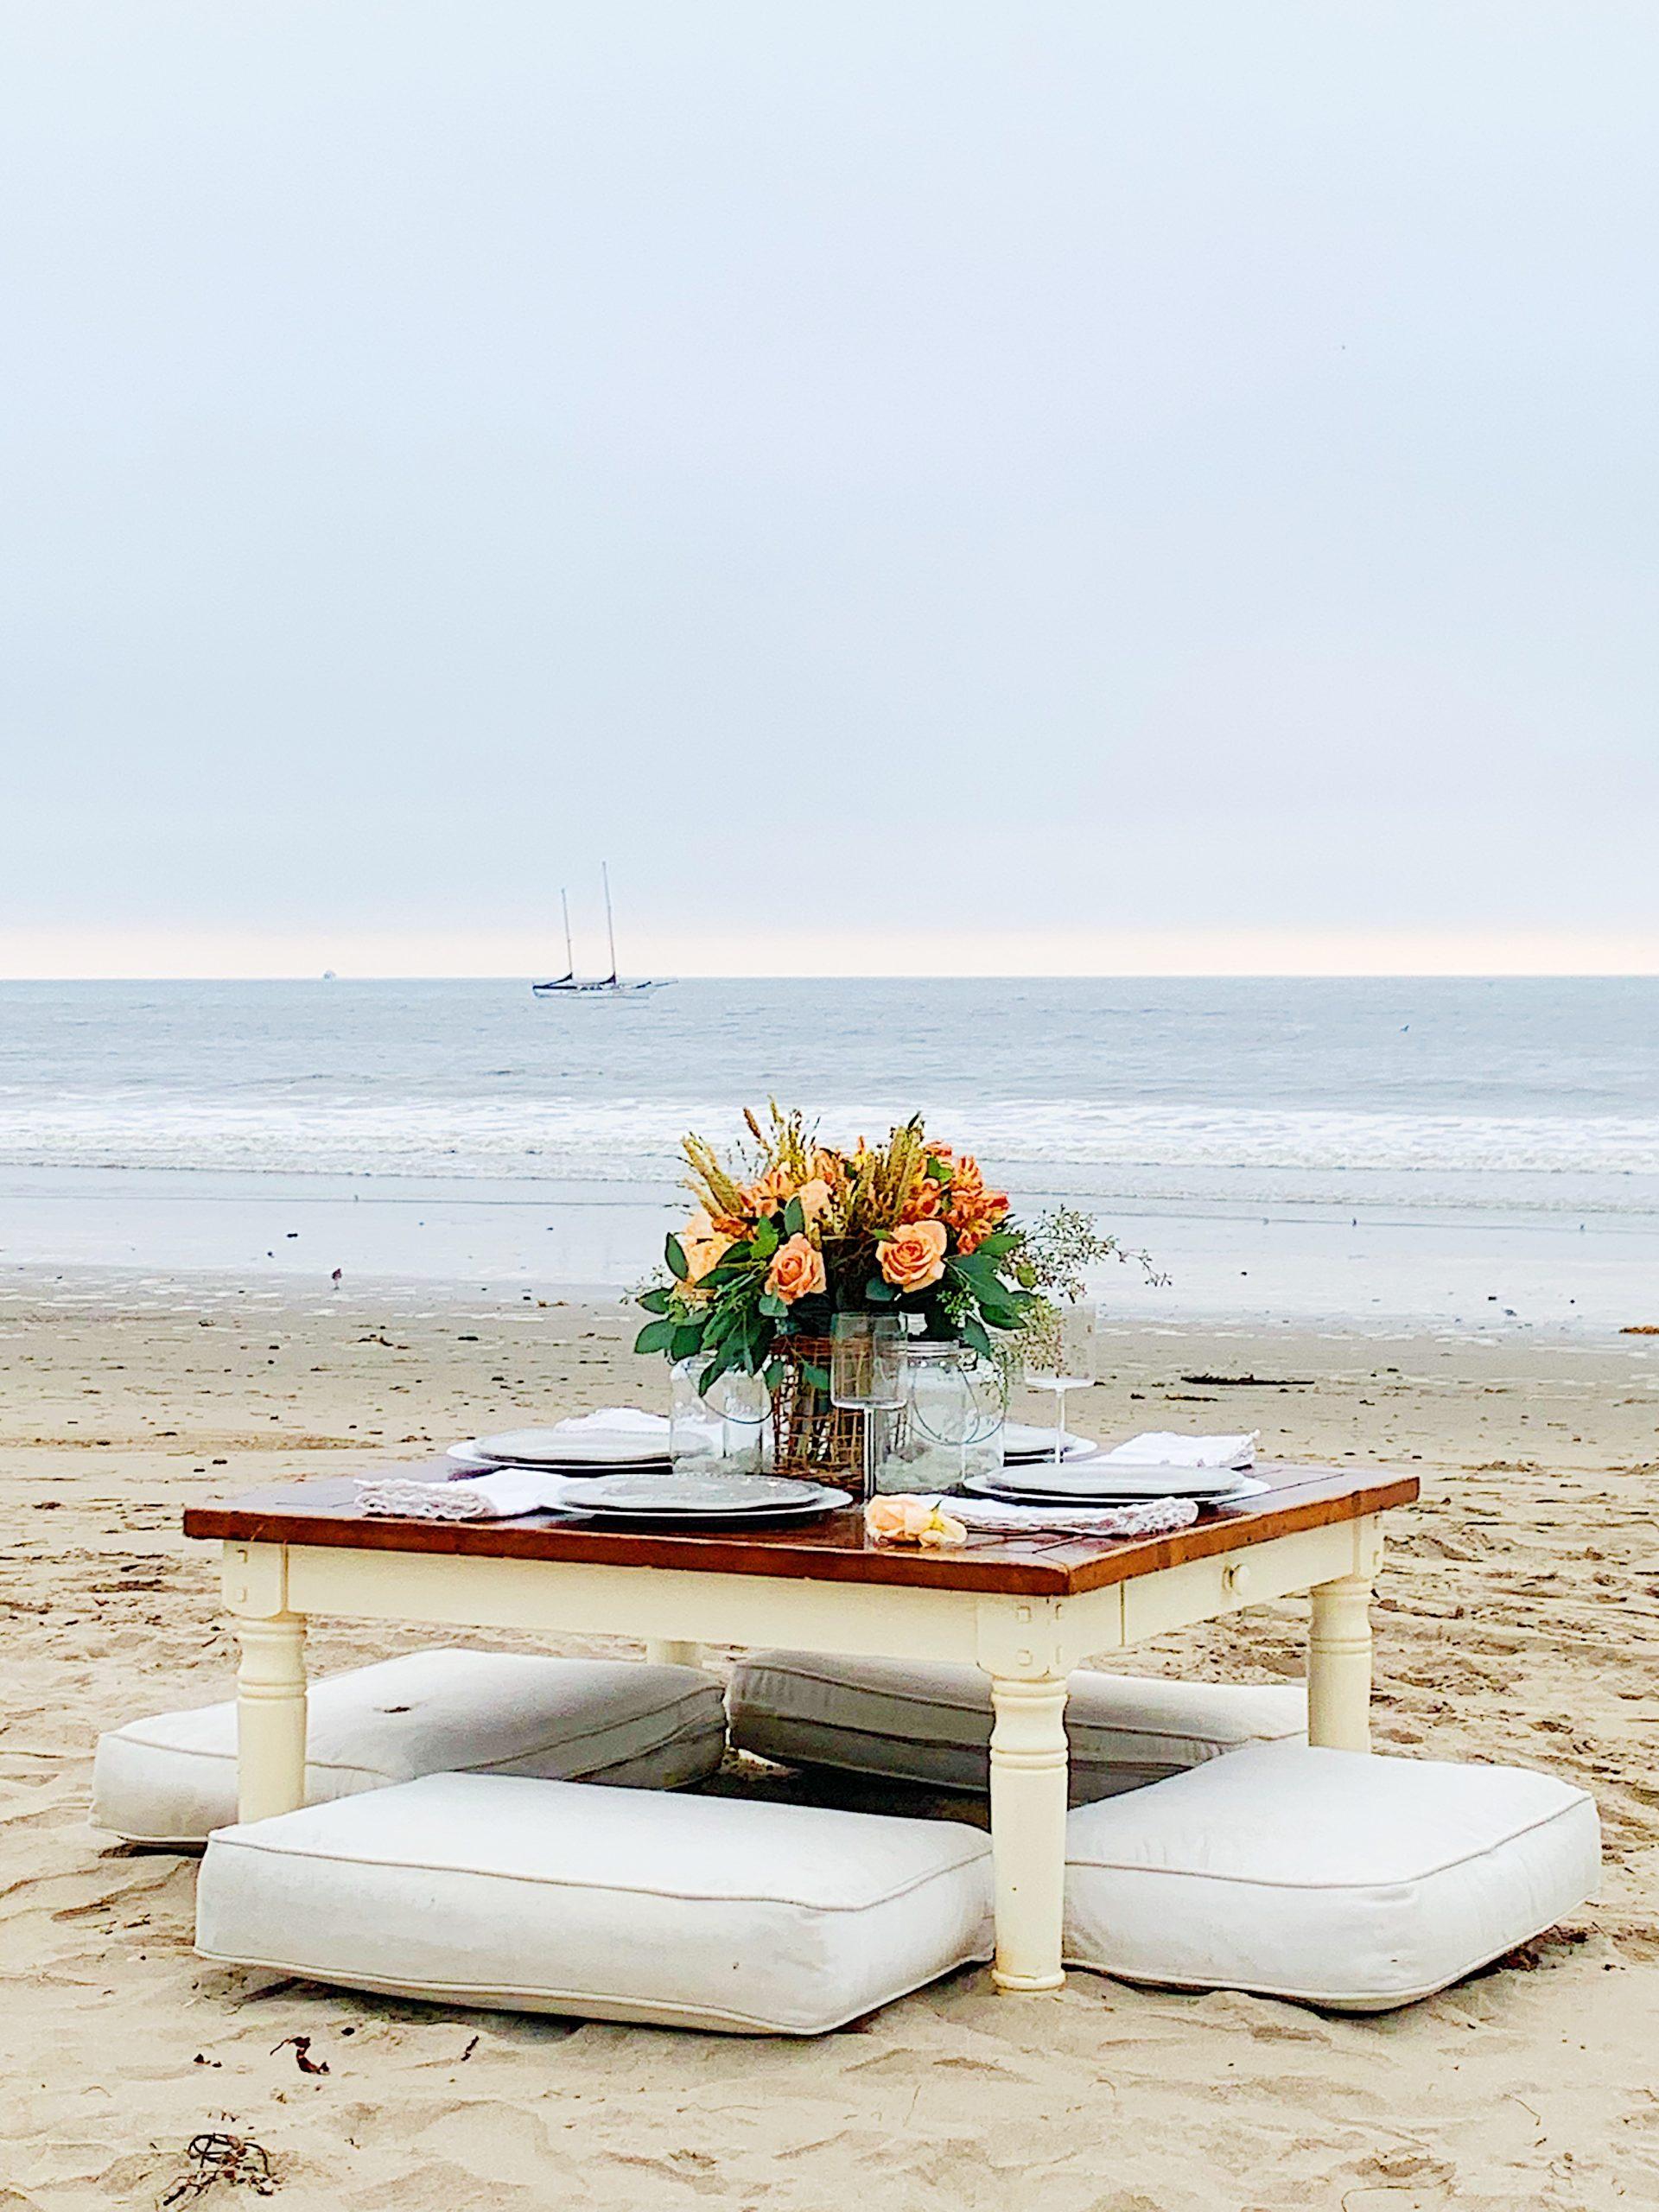 Dinner on the Beach on a Cloudy Day 1